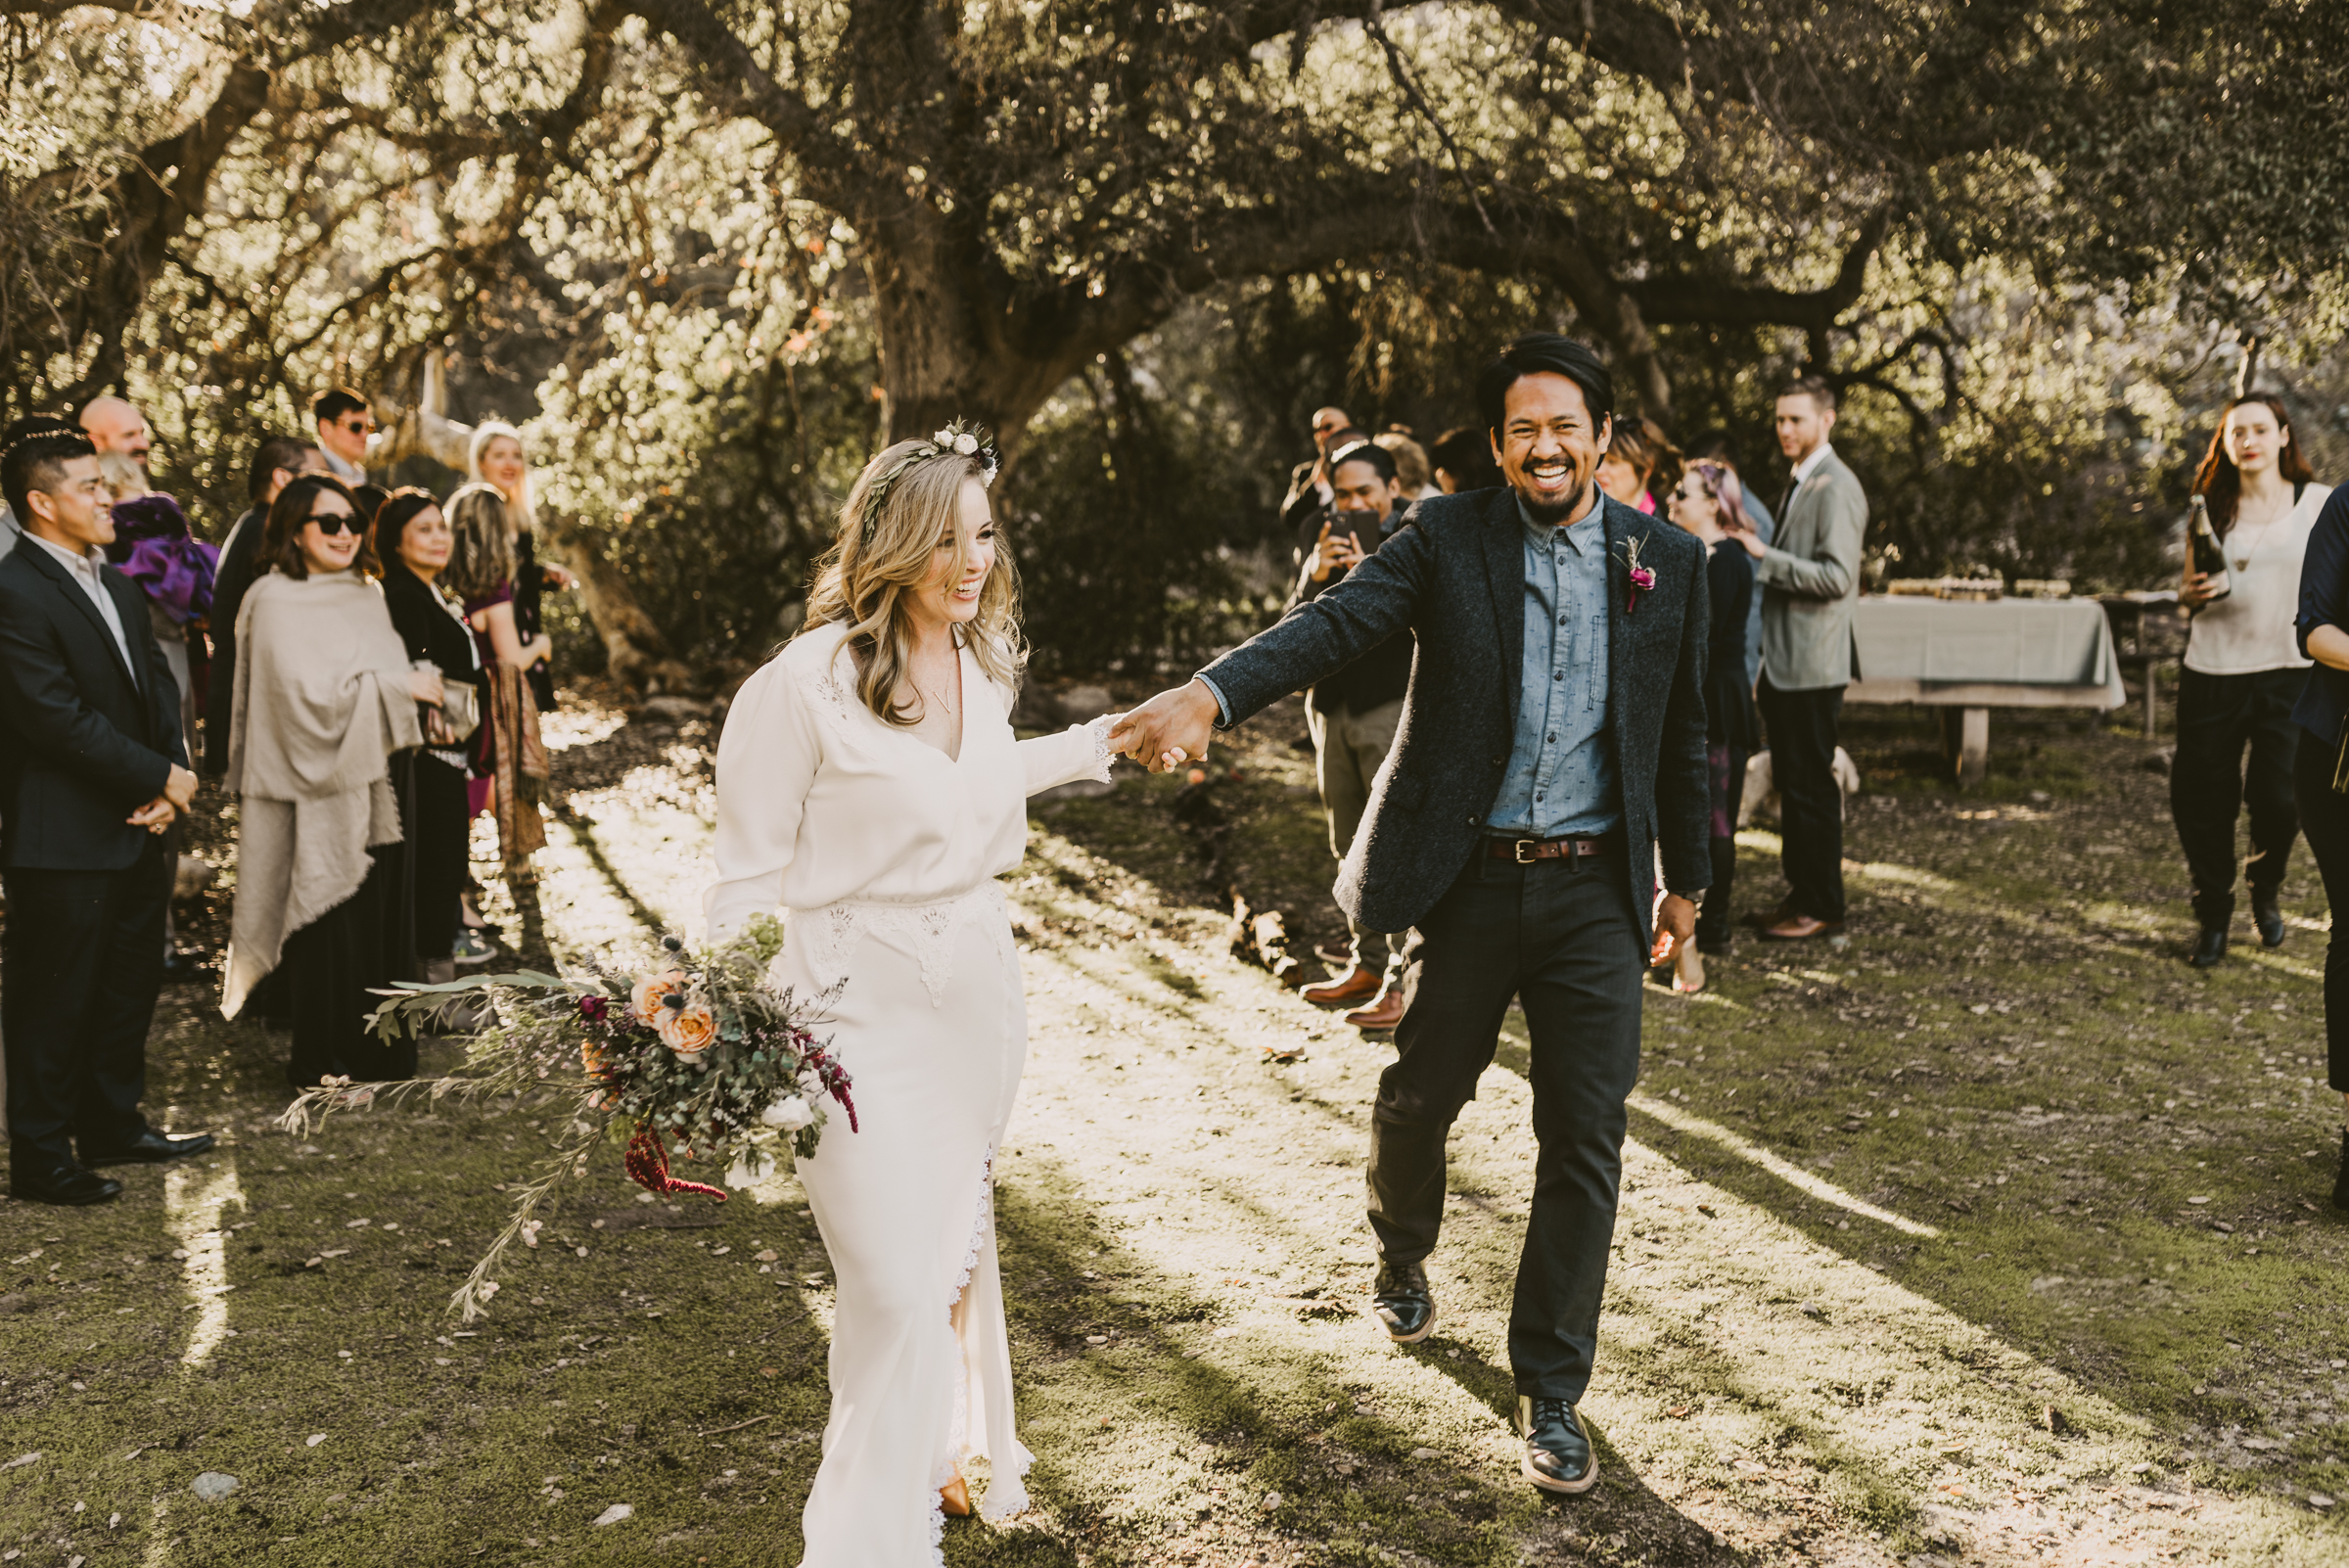 ©Isaiah + Taylor Photography - Intimate Elopement, Eaton Canyon, Los Angeles Wedding Photographer-42.jpg